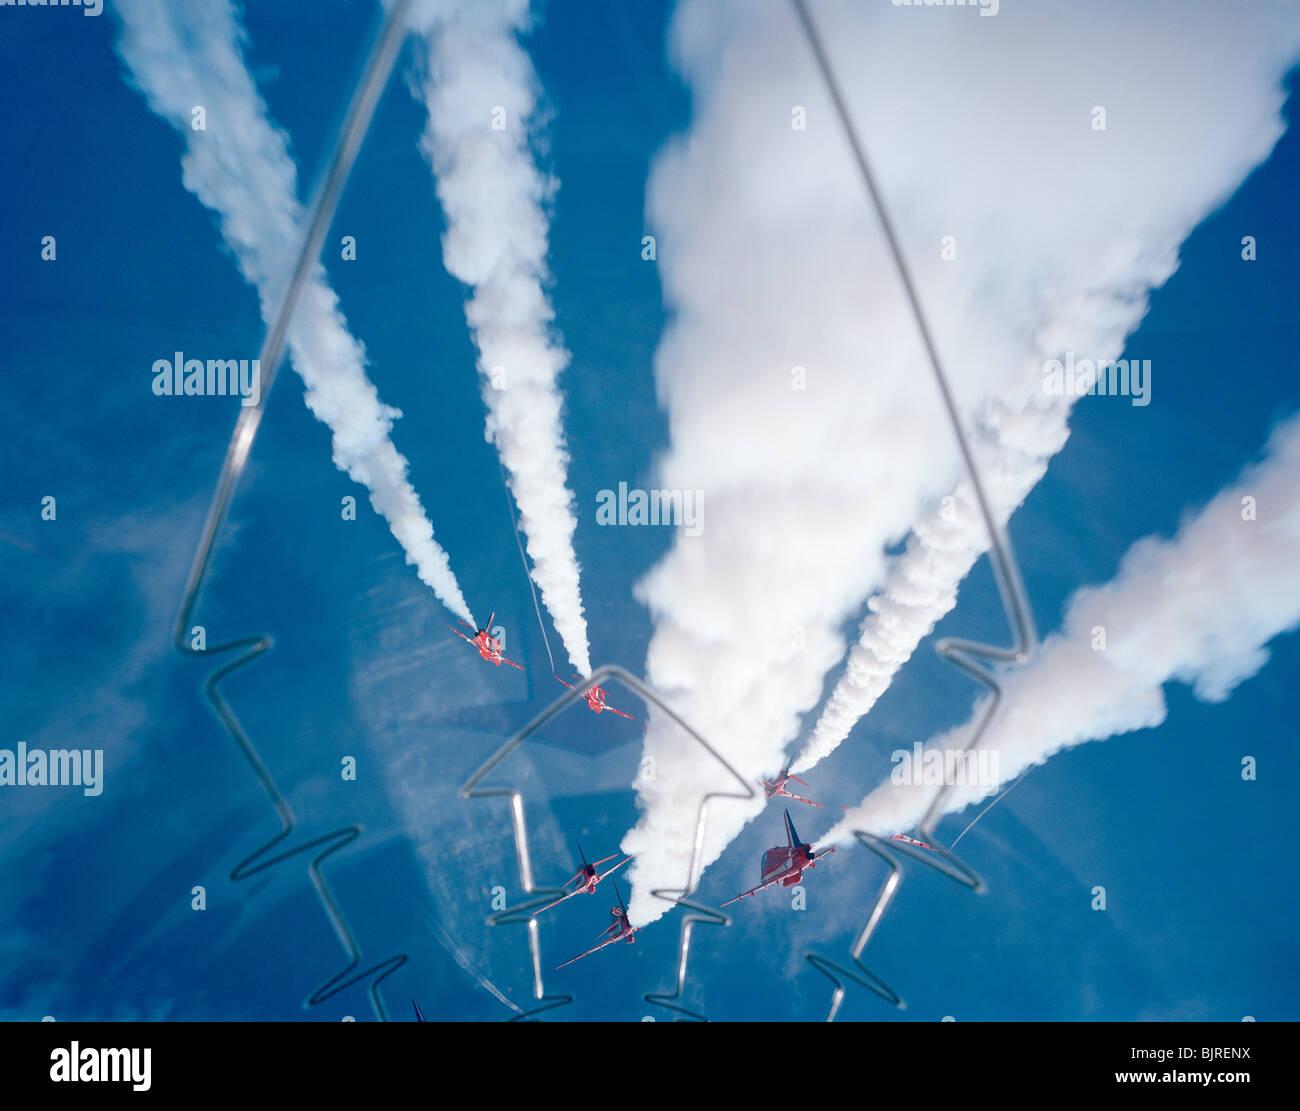 red-arrows-perform-the-54-split-high-dur